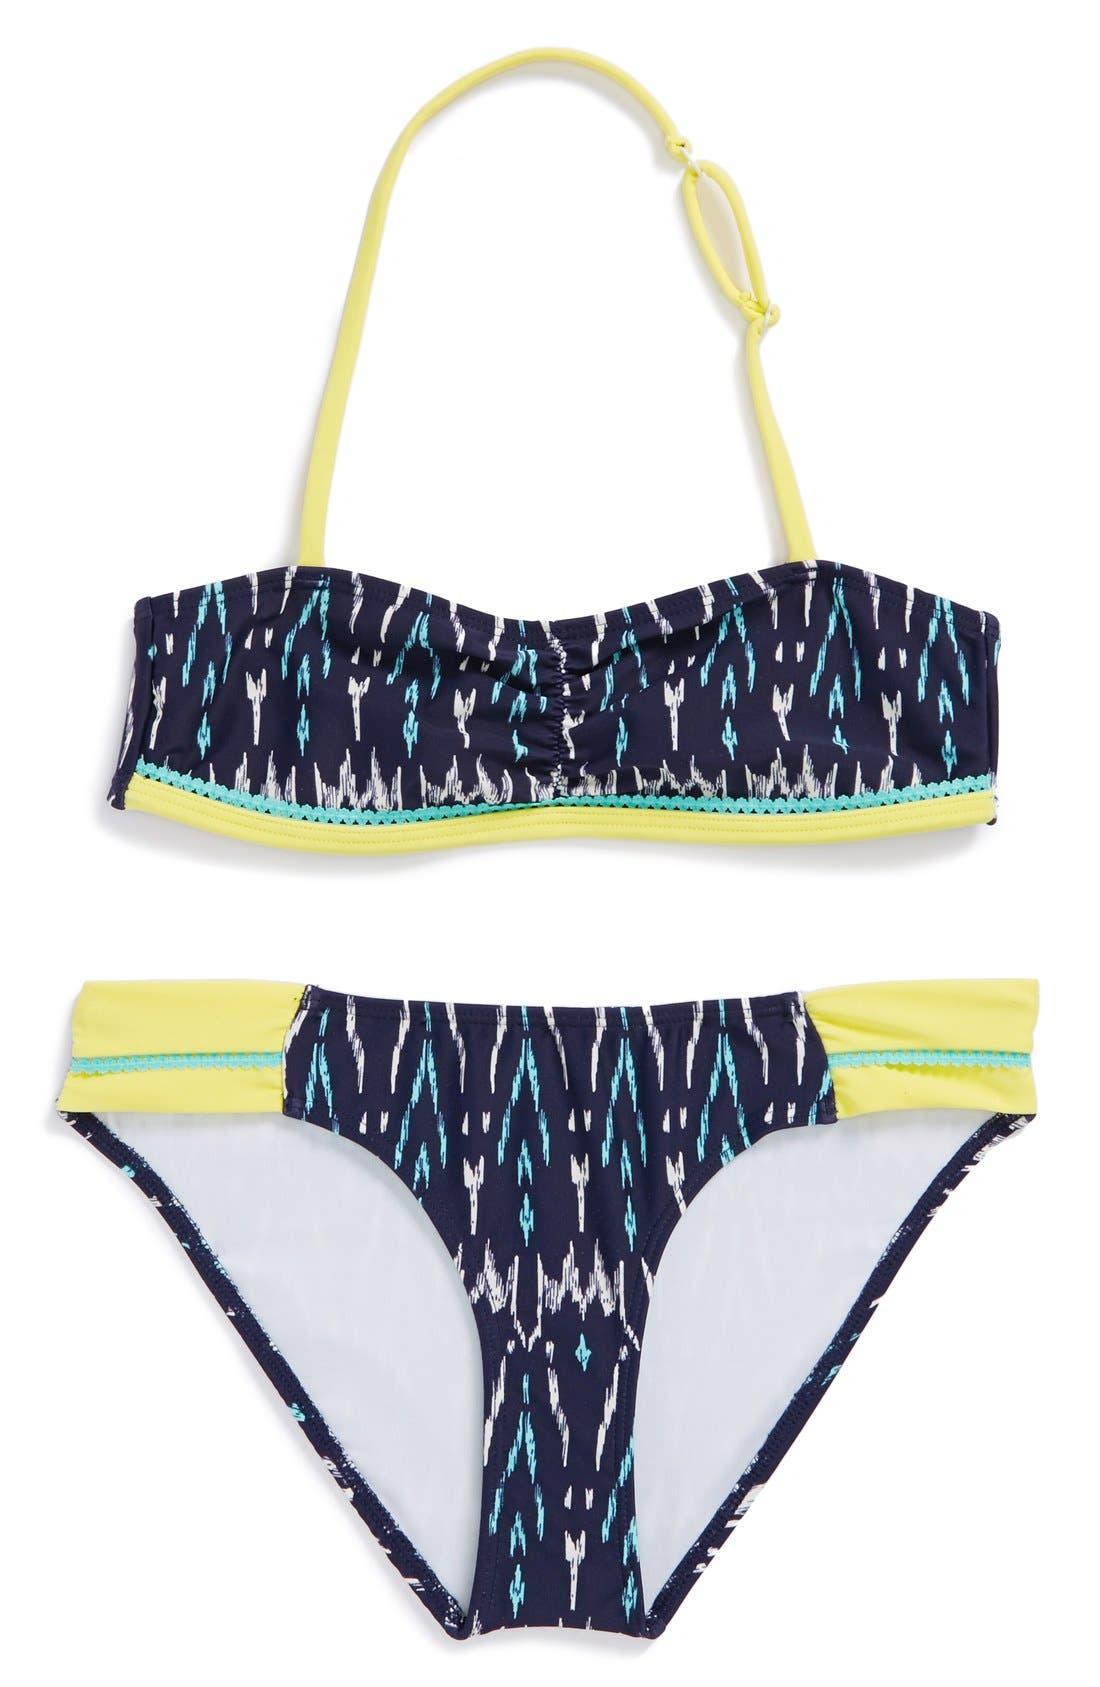 Main Image - Tucker + Tate 'Tropical' Two-Piece Swimsuit (Big Girls)